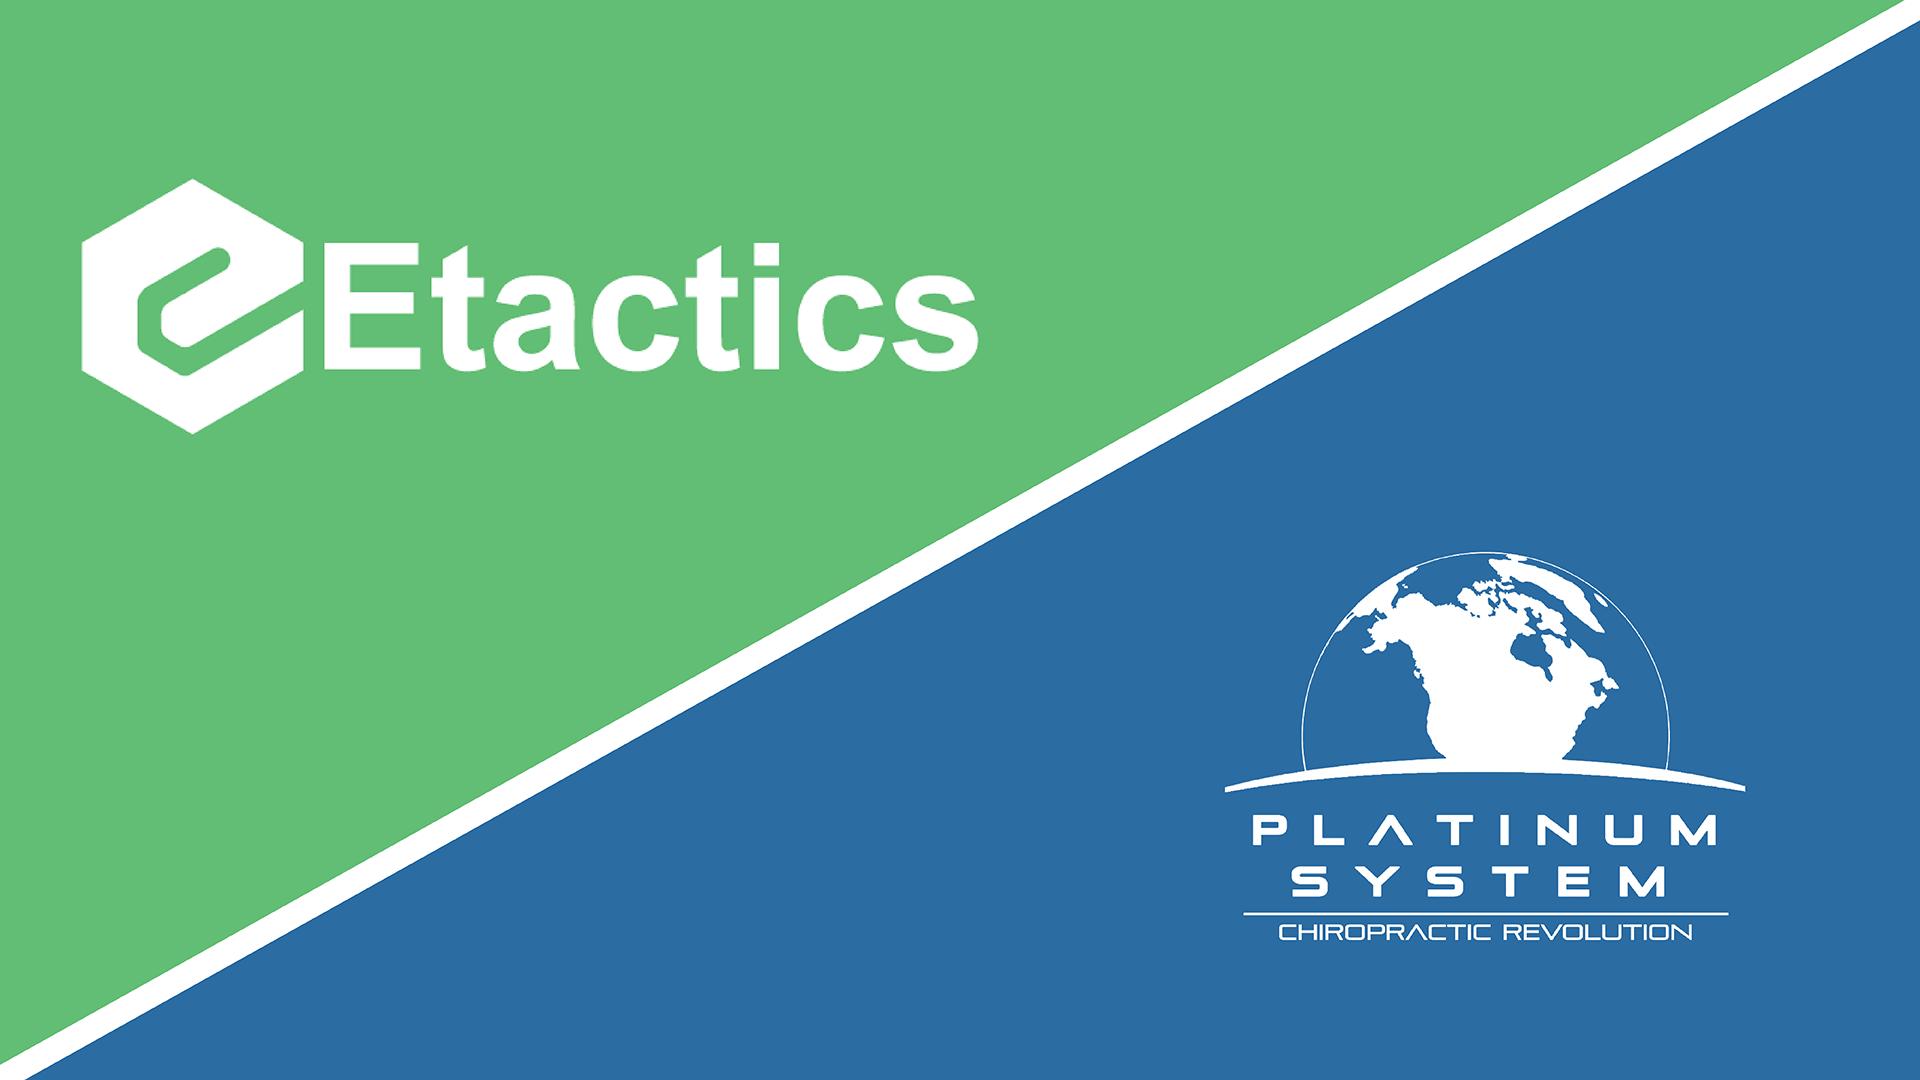 PlatinumEtacticsImage-01.png